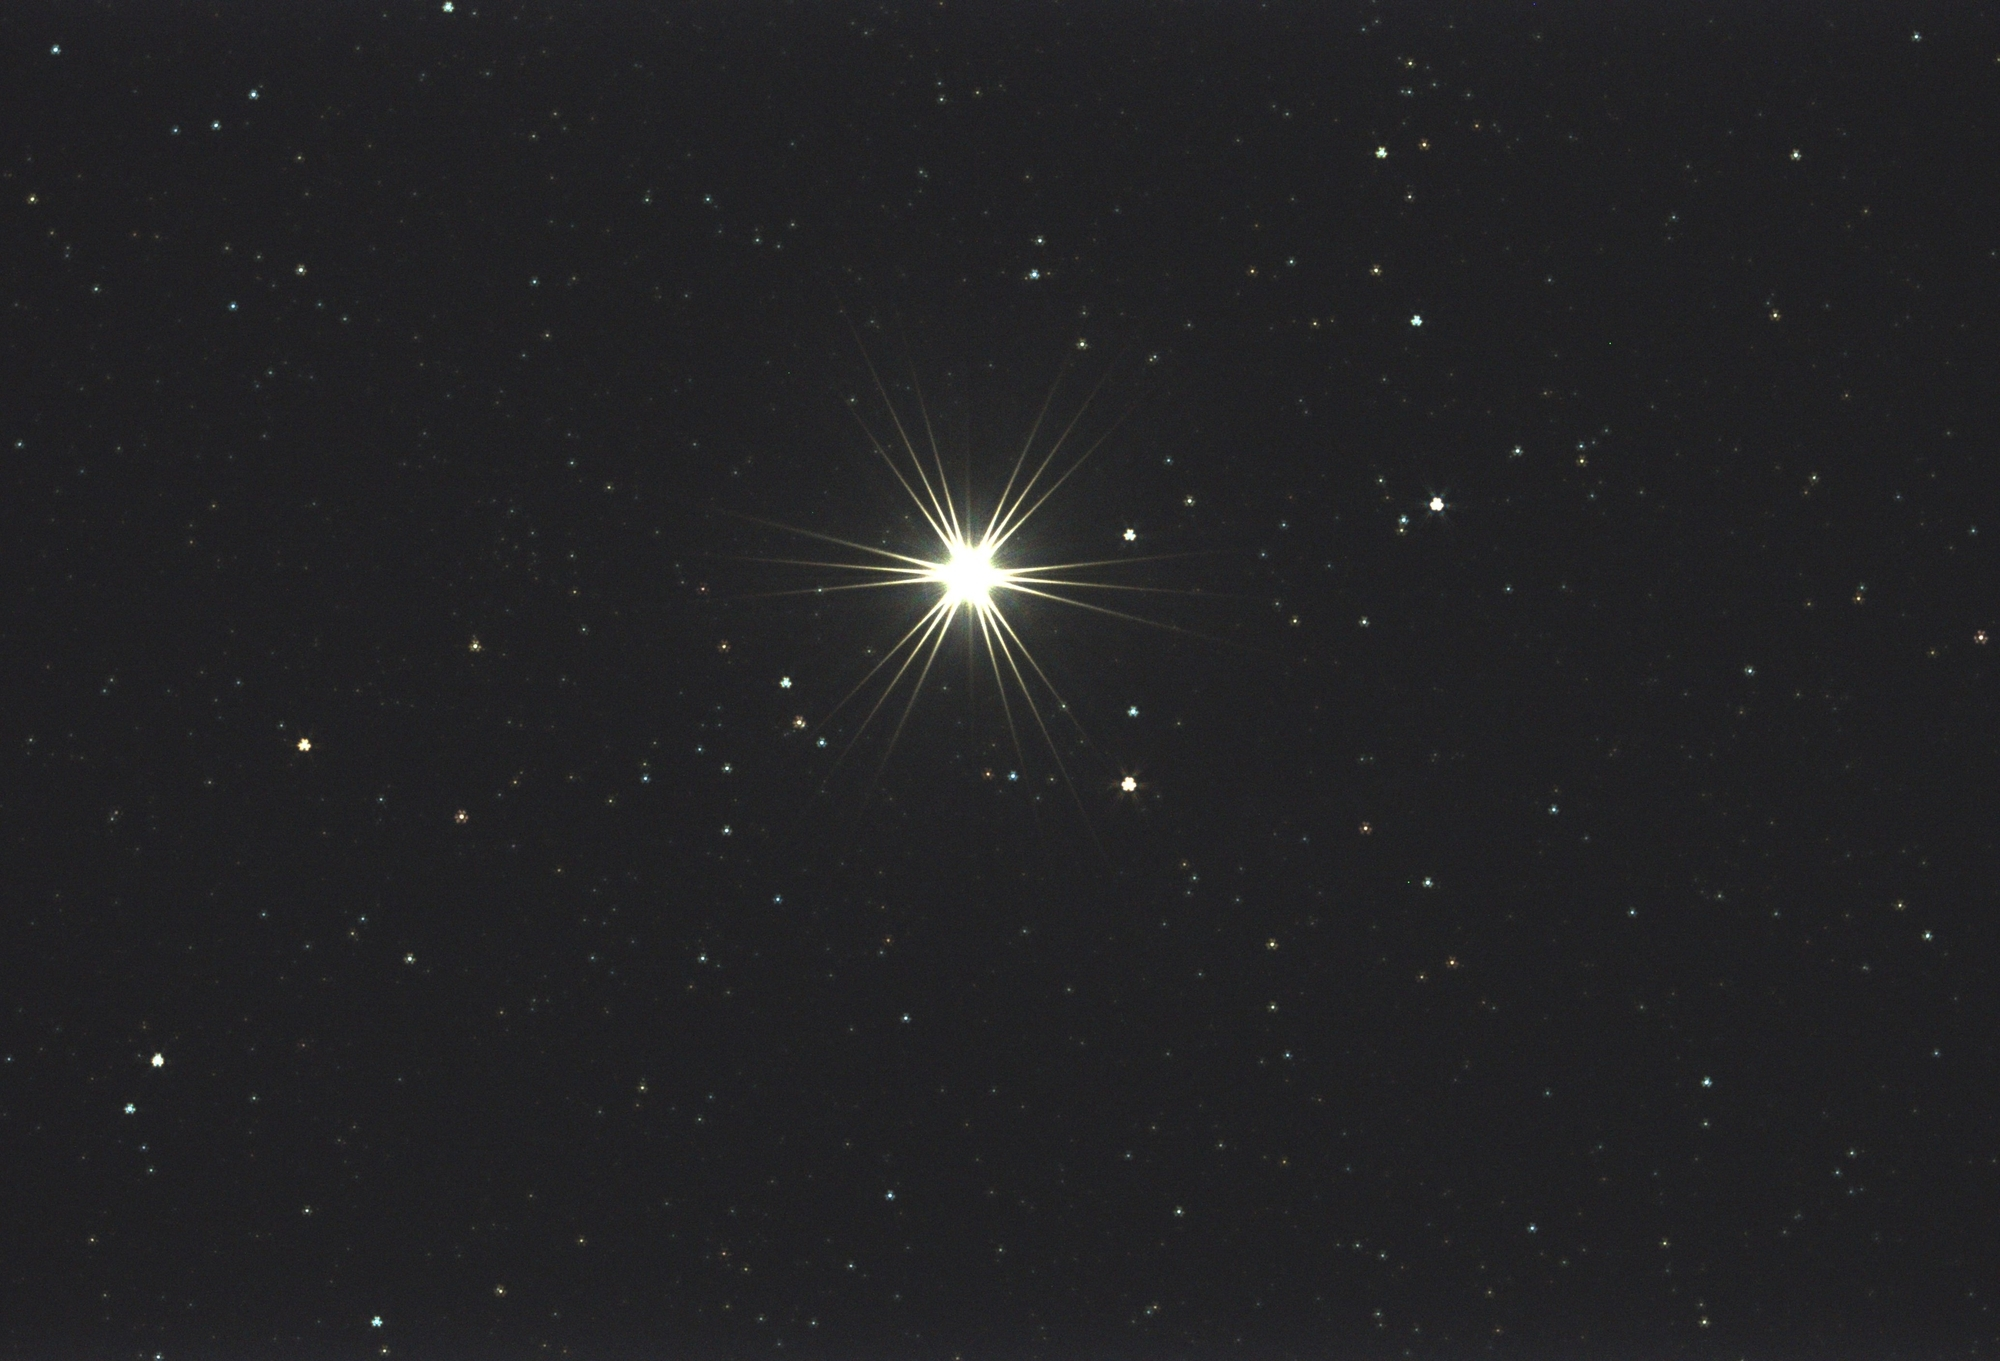 f:id:snct-astro:20200204000855j:plain